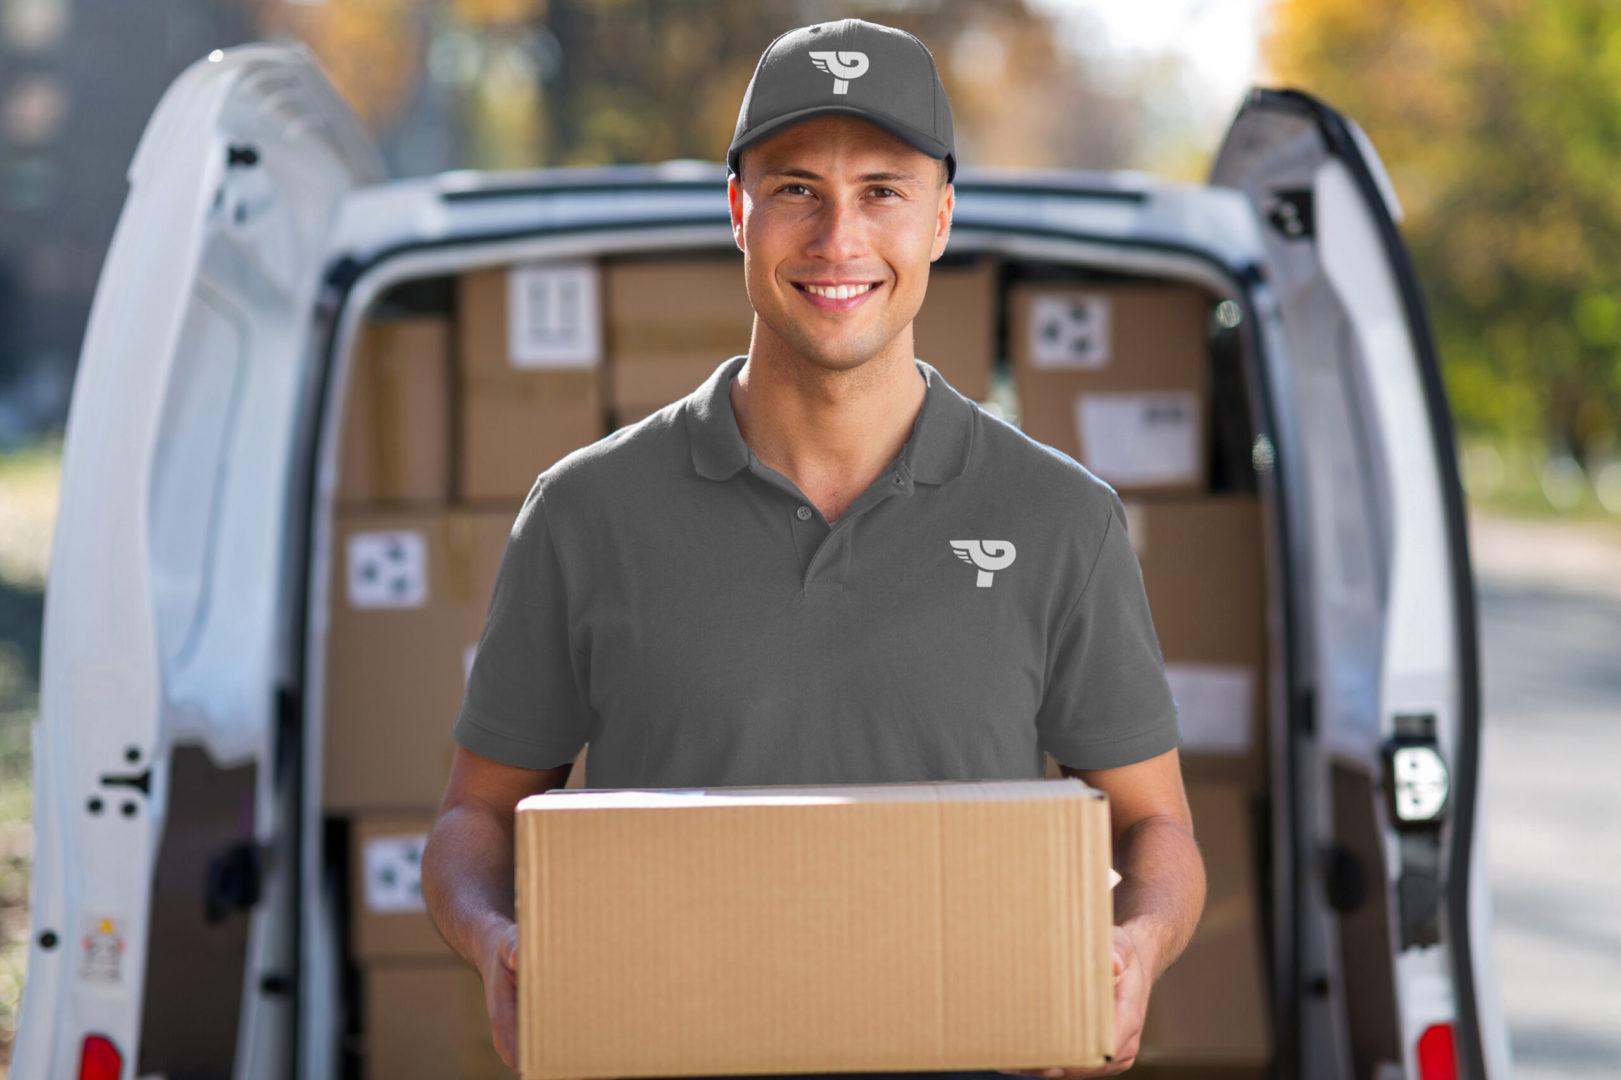 courier driver, delivery parcels